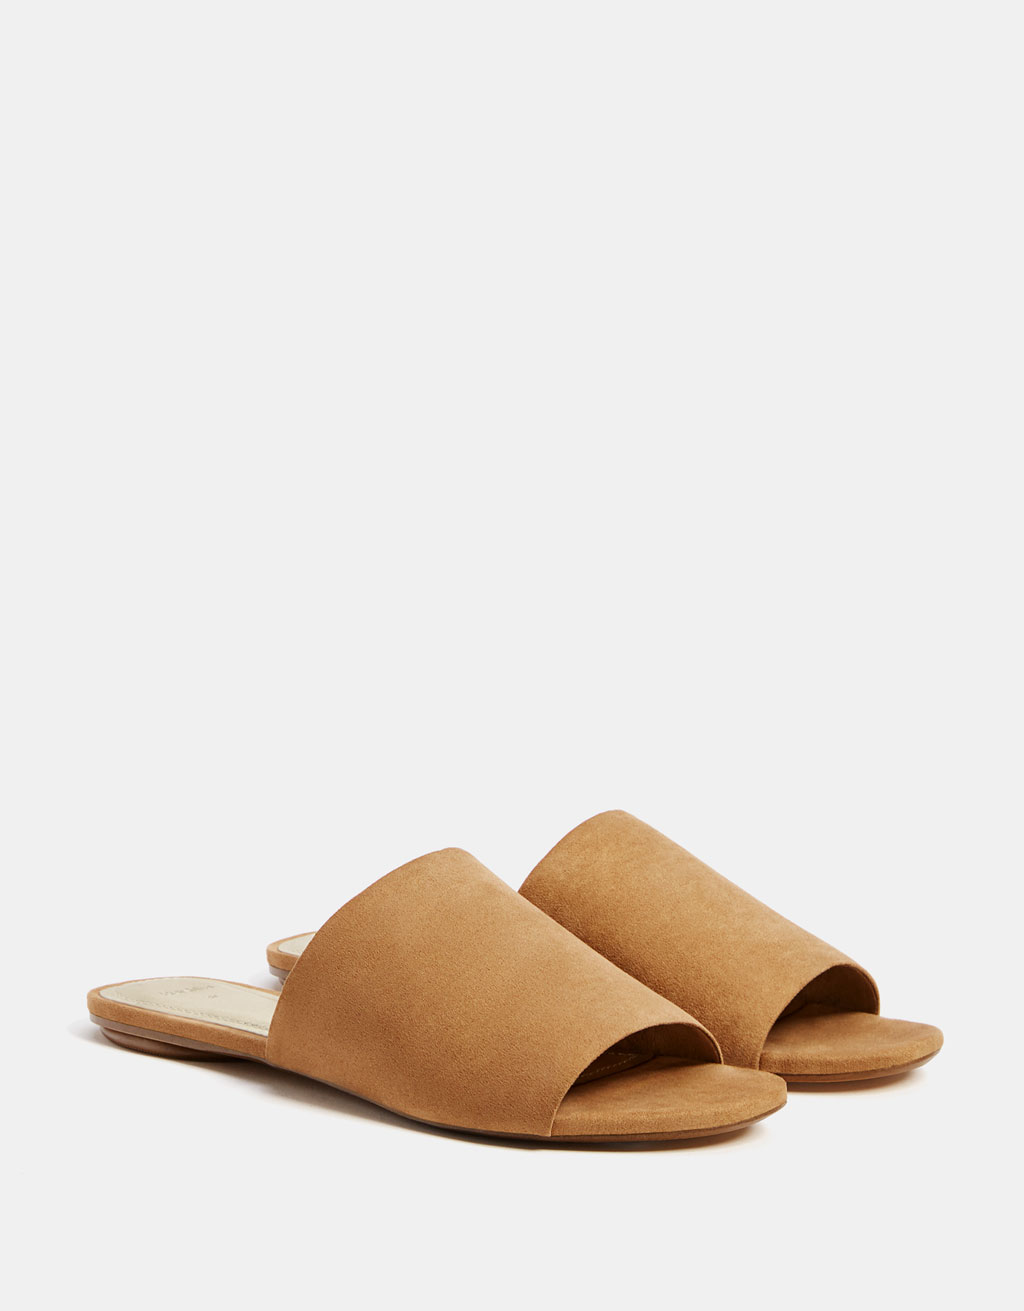 Tan slides